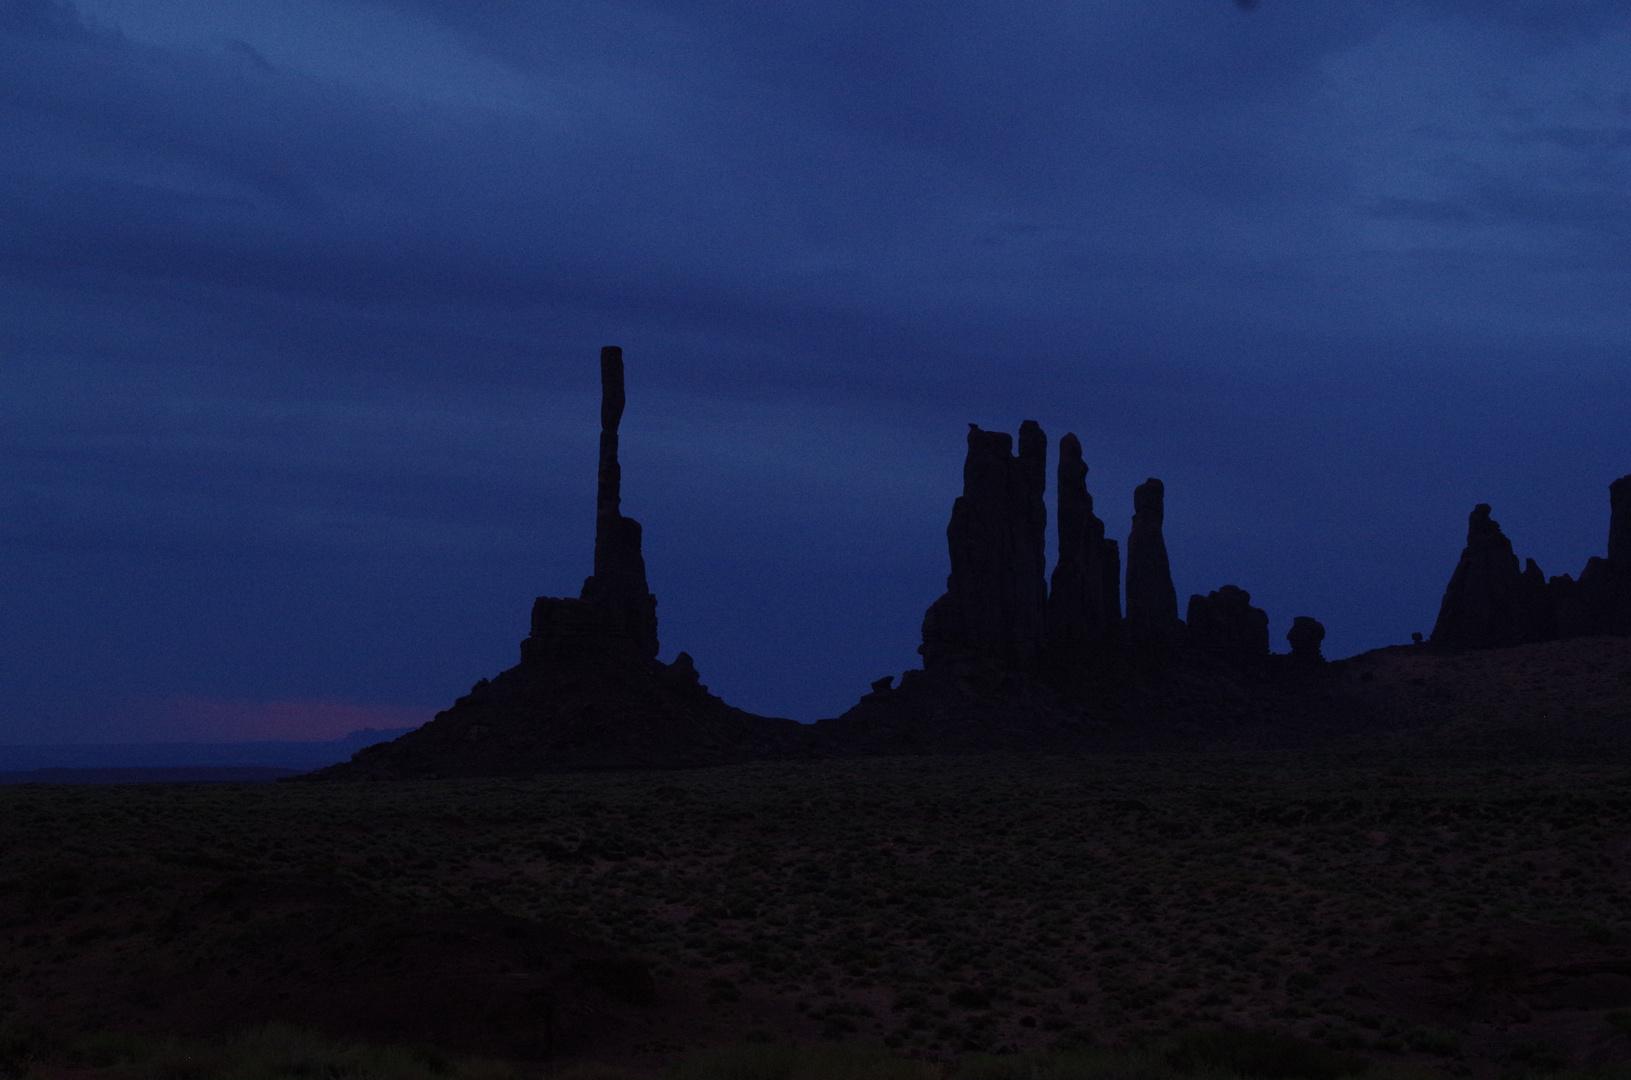 Totem Pole kurz vor Sonnenaufgang